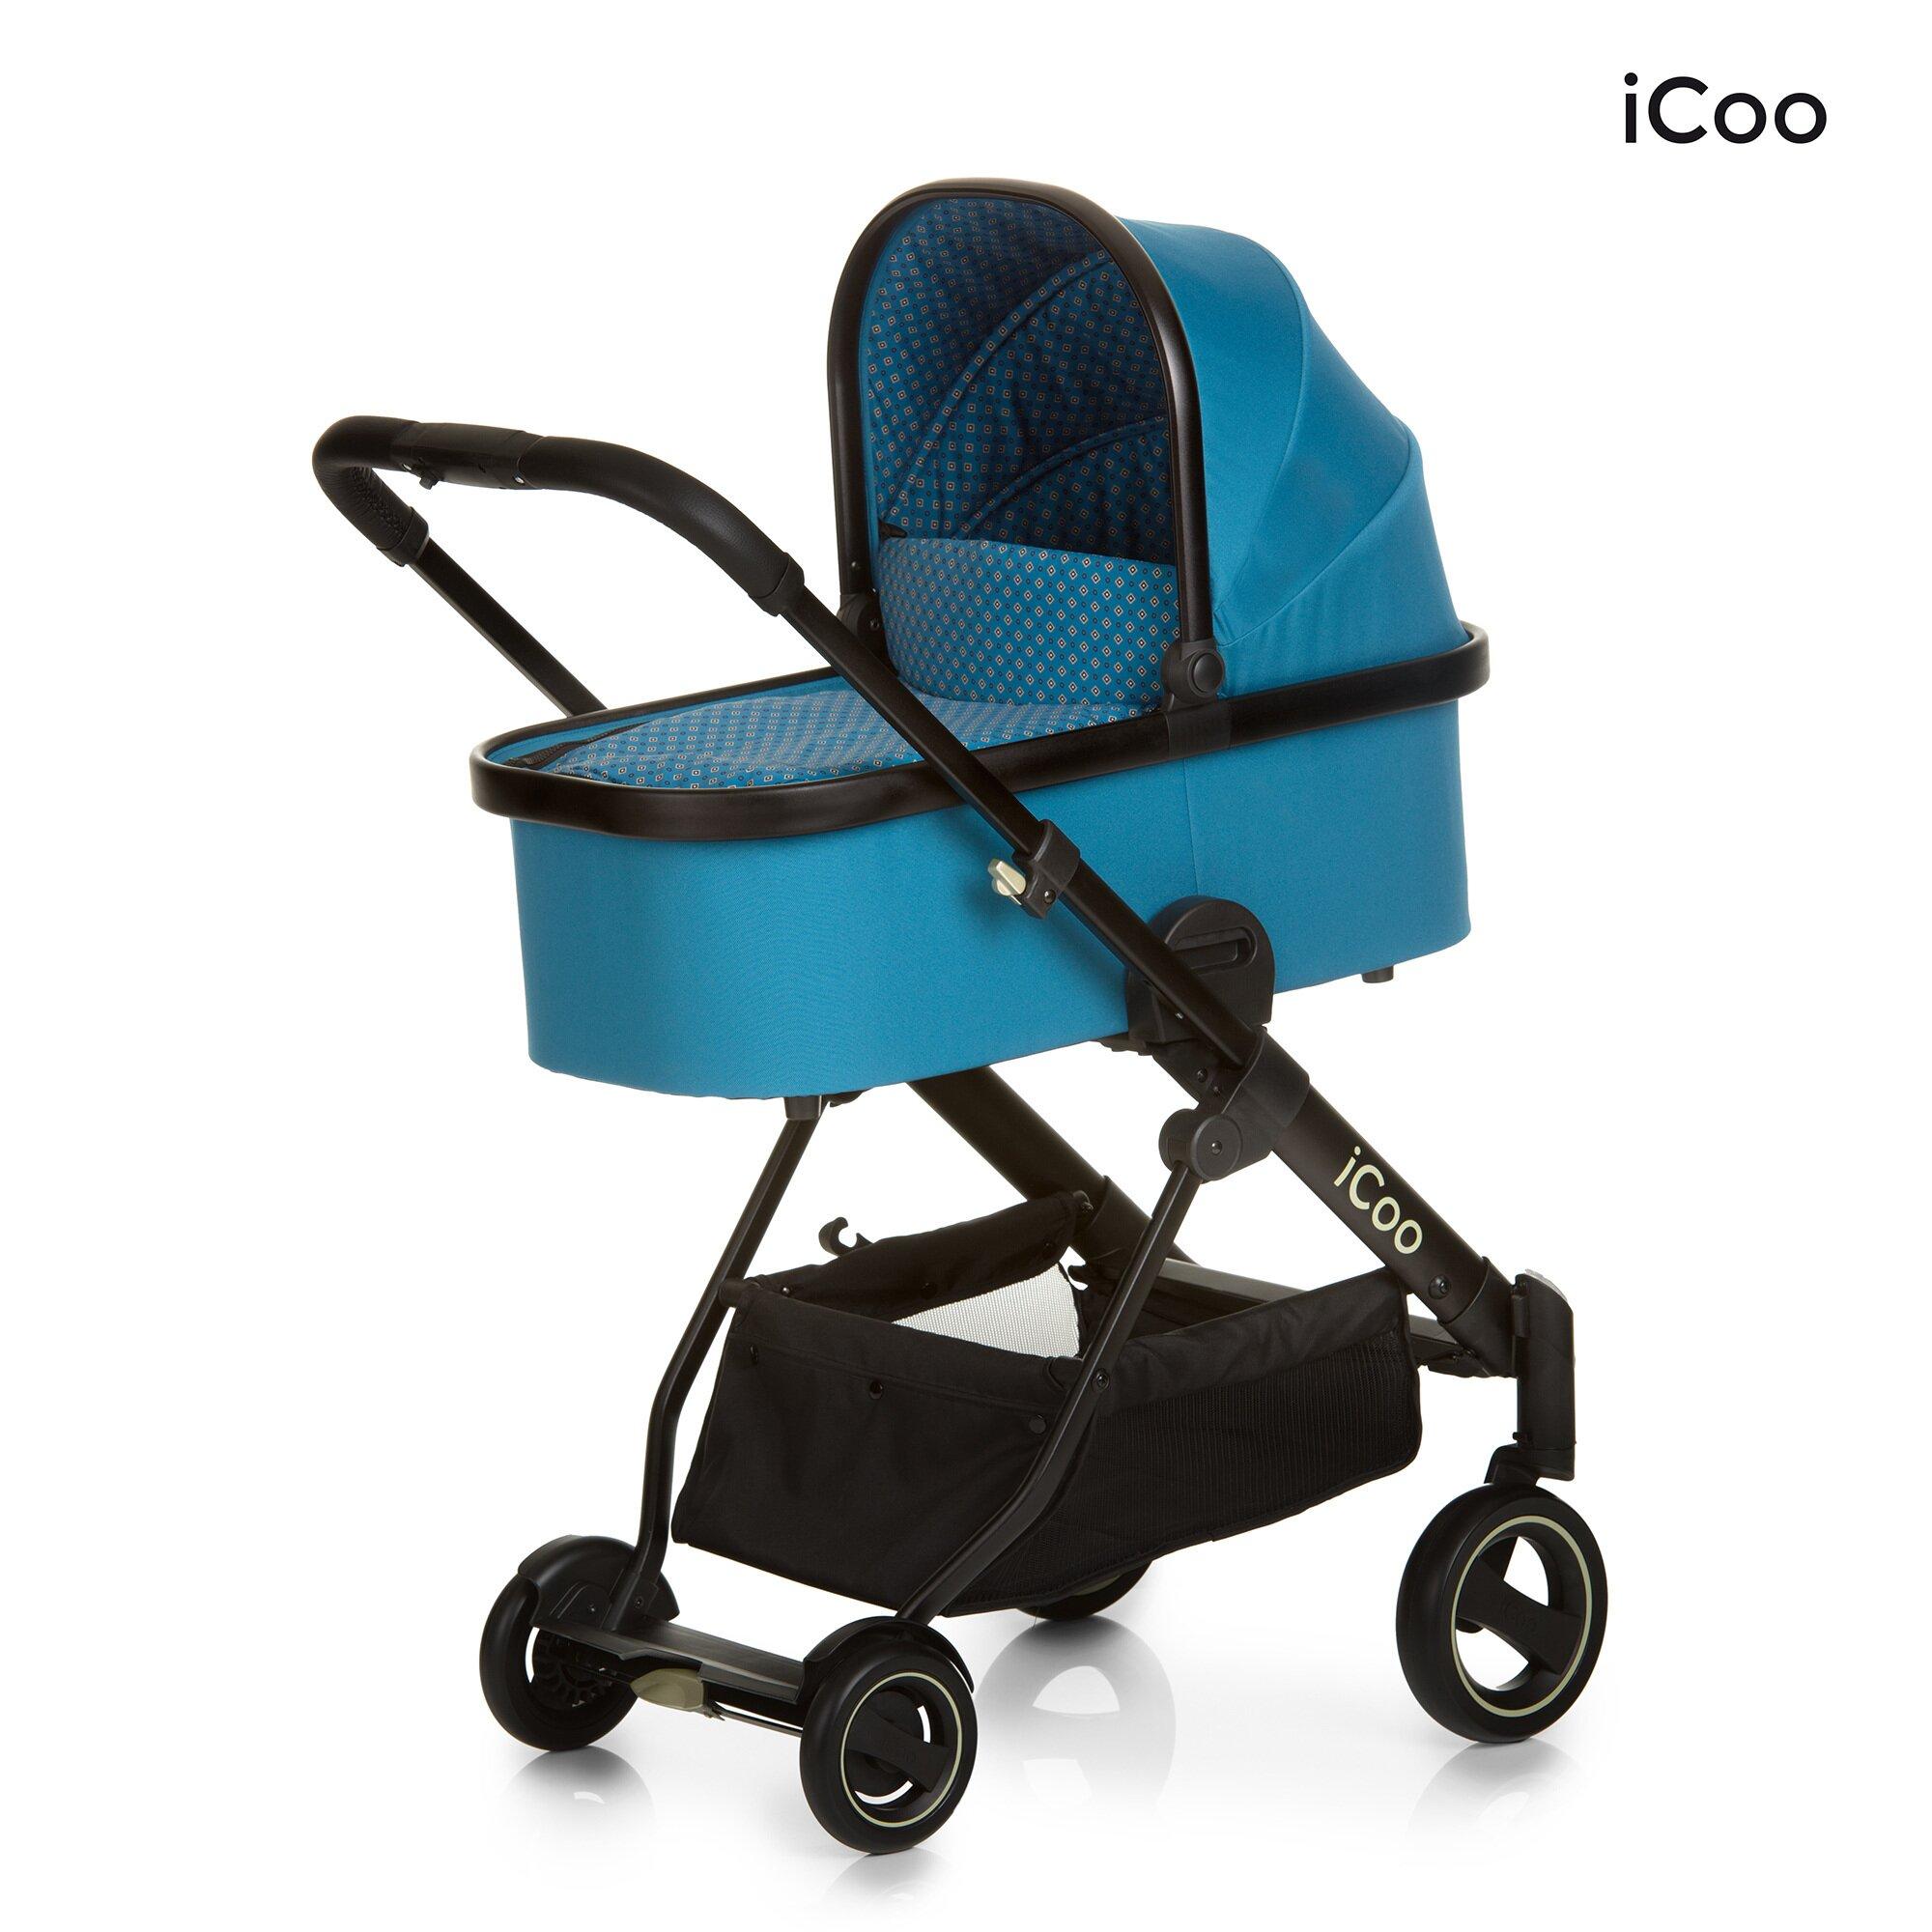 icoo-acrobat-xl-plus-kombikinderwagen-trio-set-incl-led-beleuchtung-tuerkis